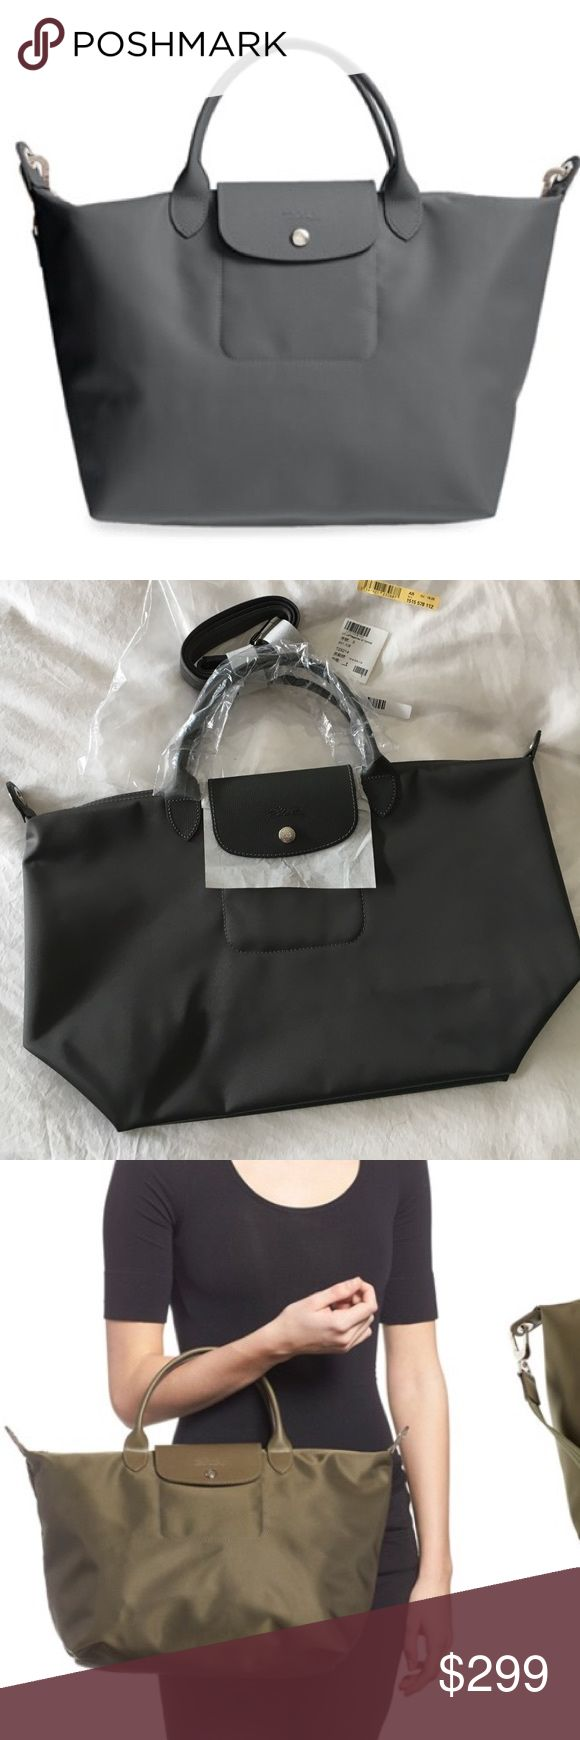 Medium Le Pliage Neo' Nylon Tote Medium Le Pliage Neo' Nylon Tote. Gray. Longchamp Bags Crossbody Bags